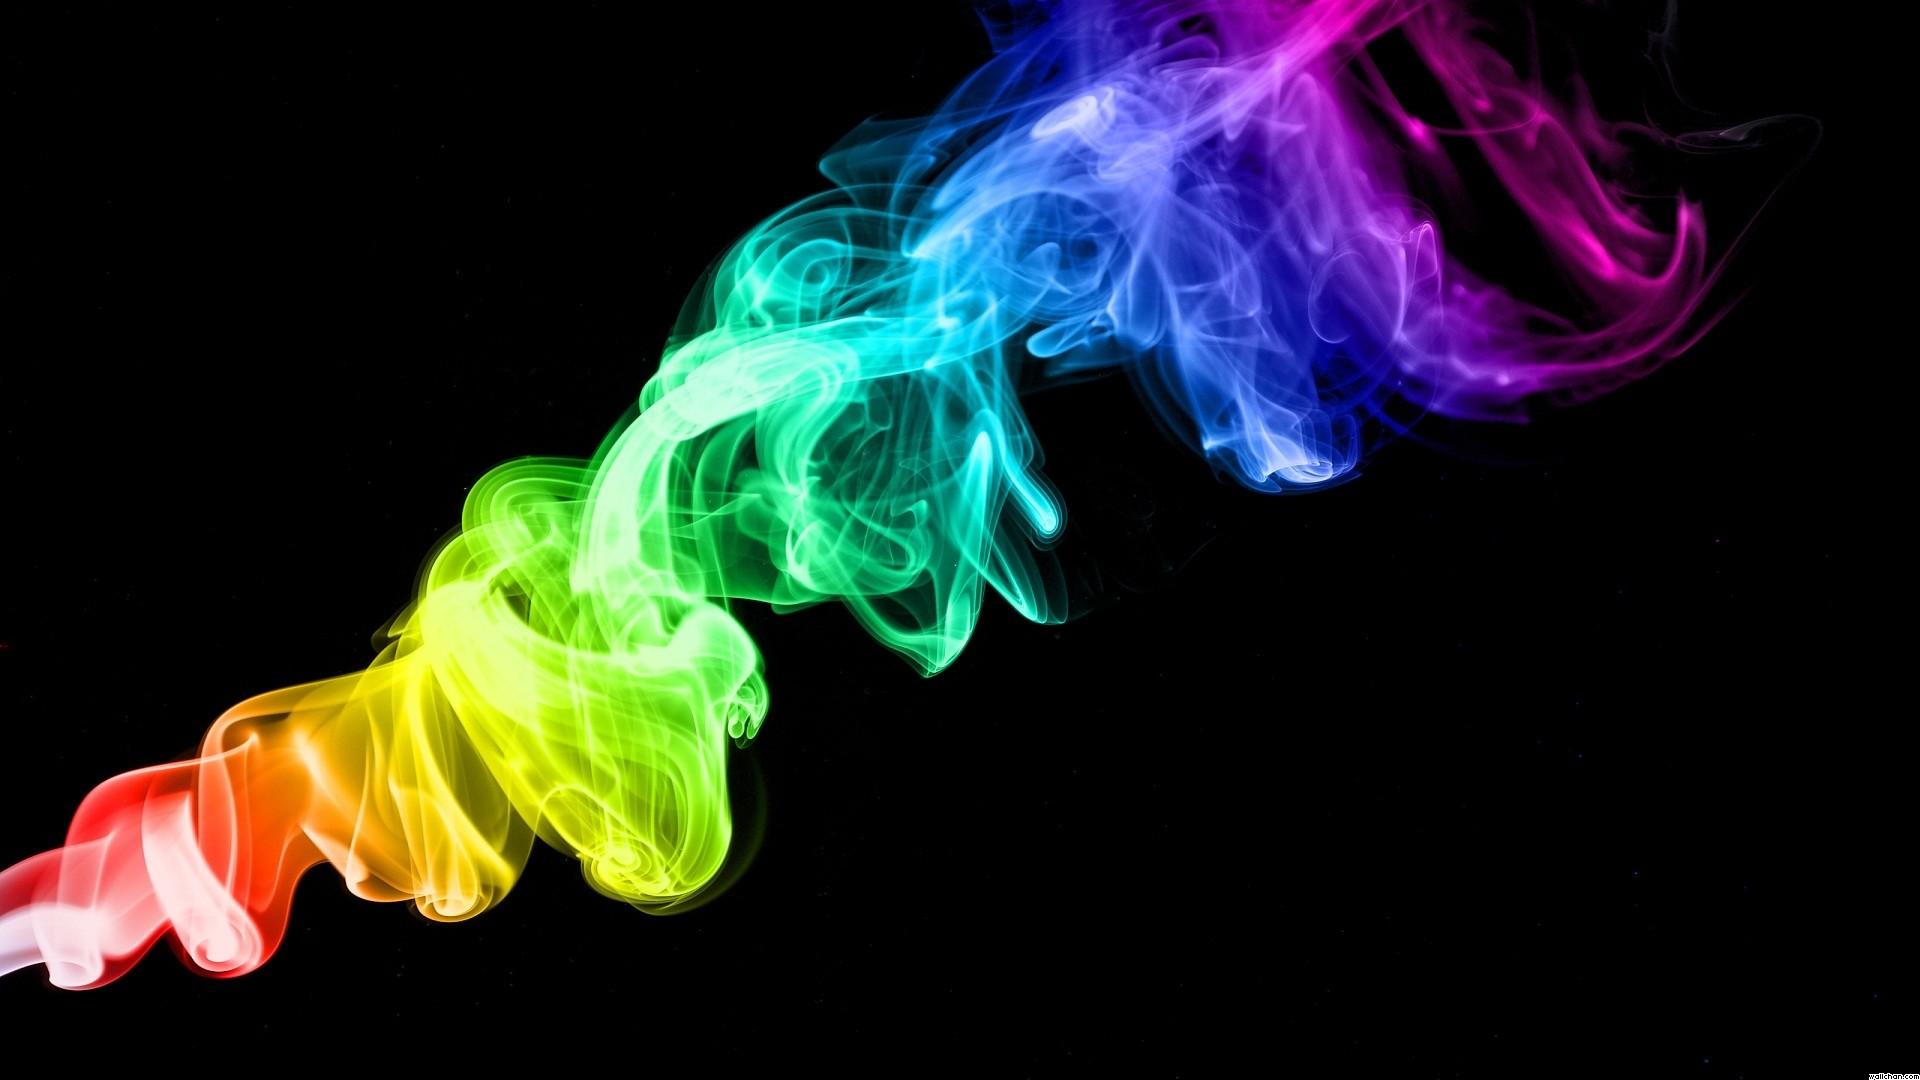 Amazing Wallpaper High Resolution Rainbow - 67351  Perfect Image Reference_100656.jpg